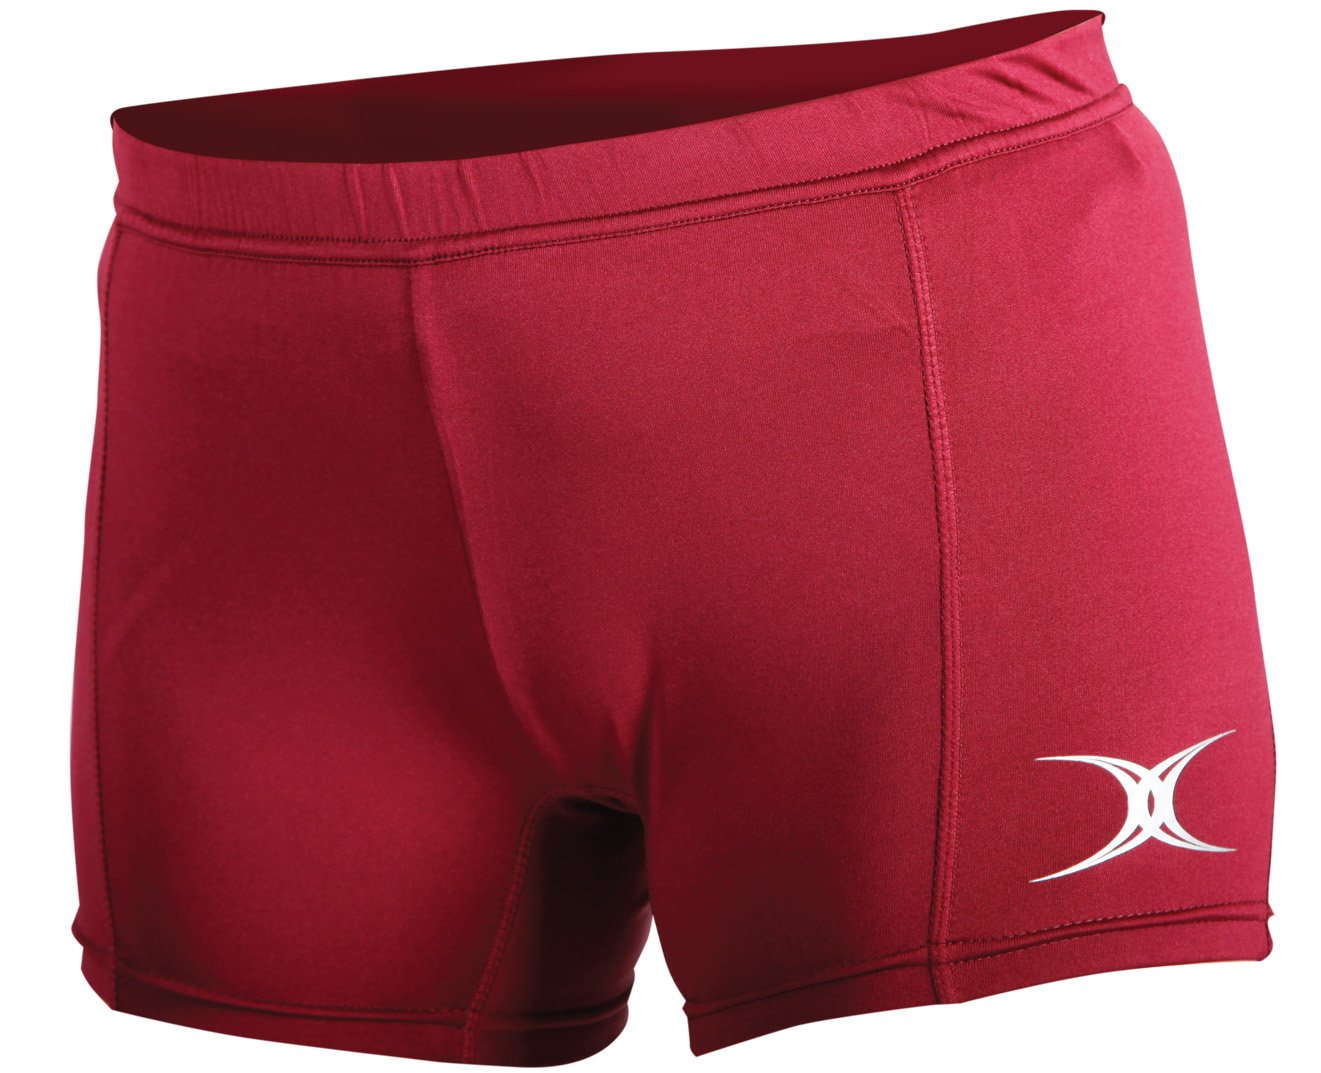 Gilbert Eclipse II Netball Shorts (Maroon Medium)